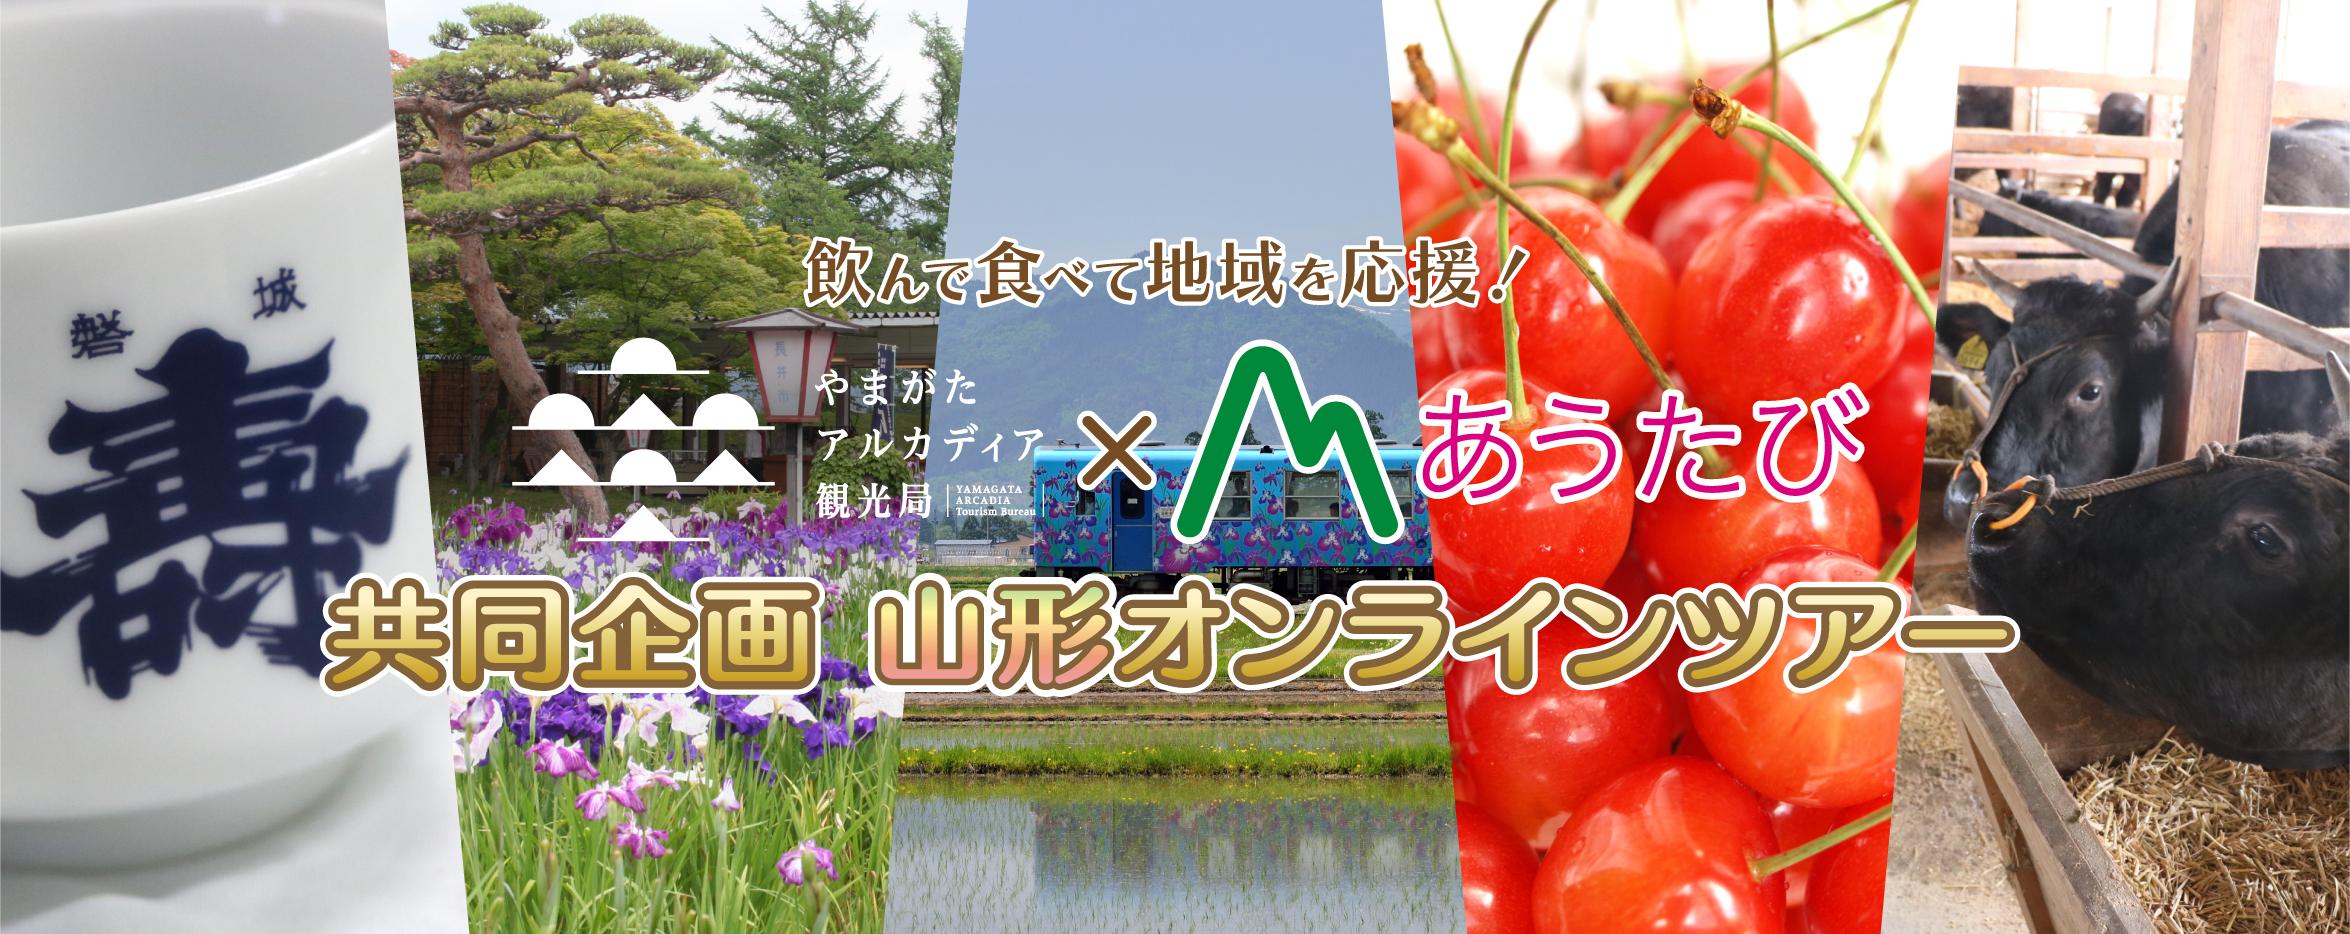 autabi_yamagata_tour_top_img01_20061501